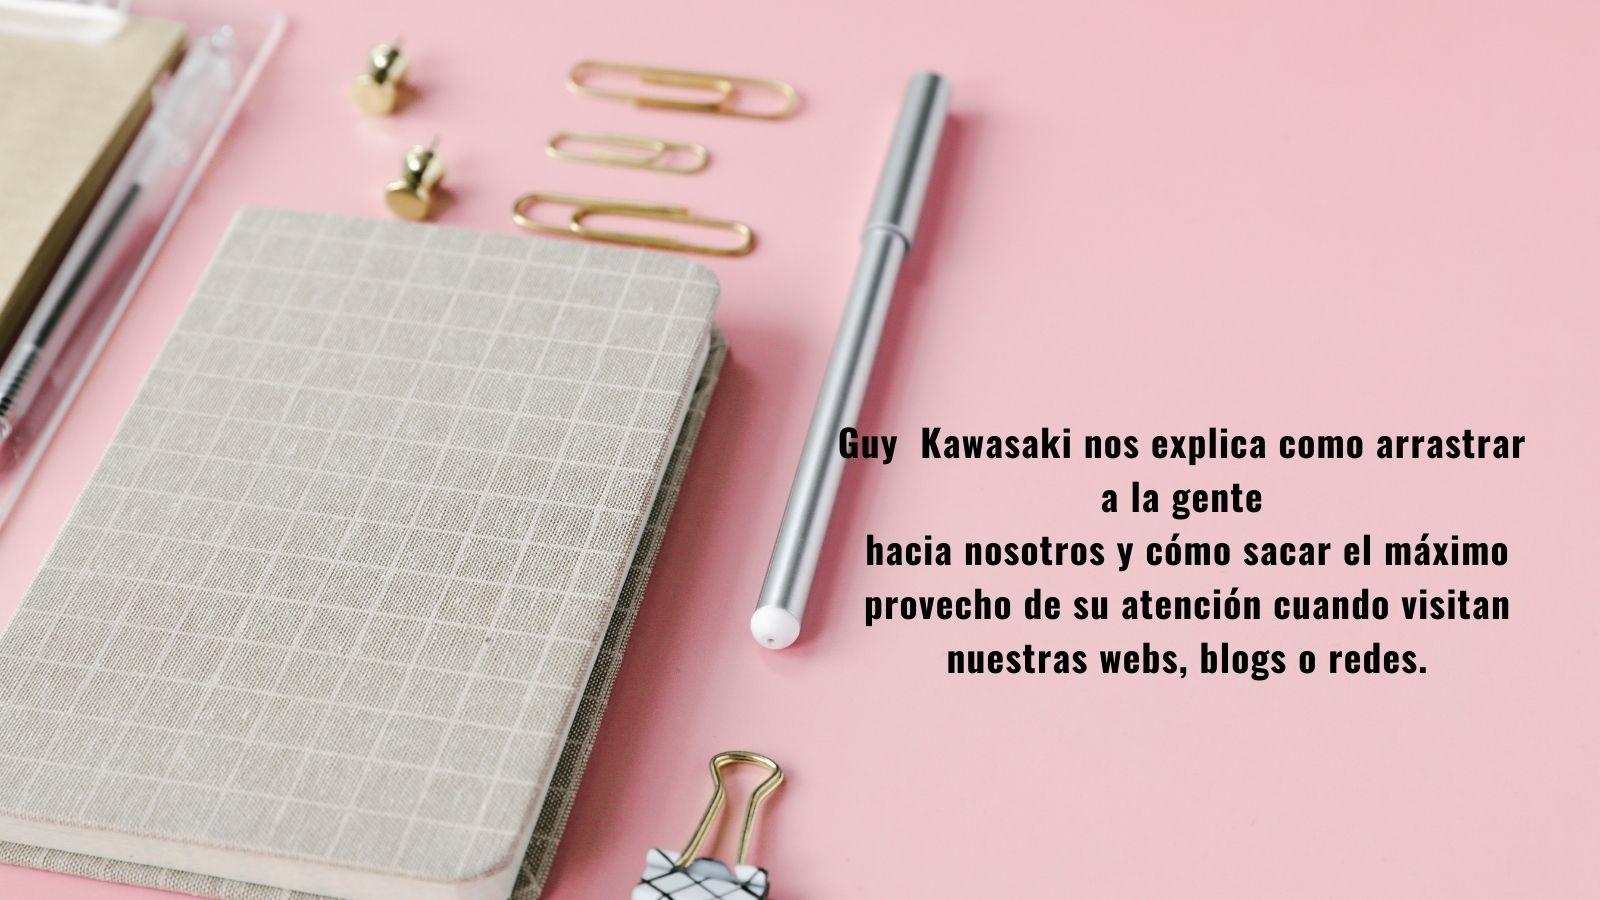 Consejos de Guy Kawasaki para gestionar contenidos